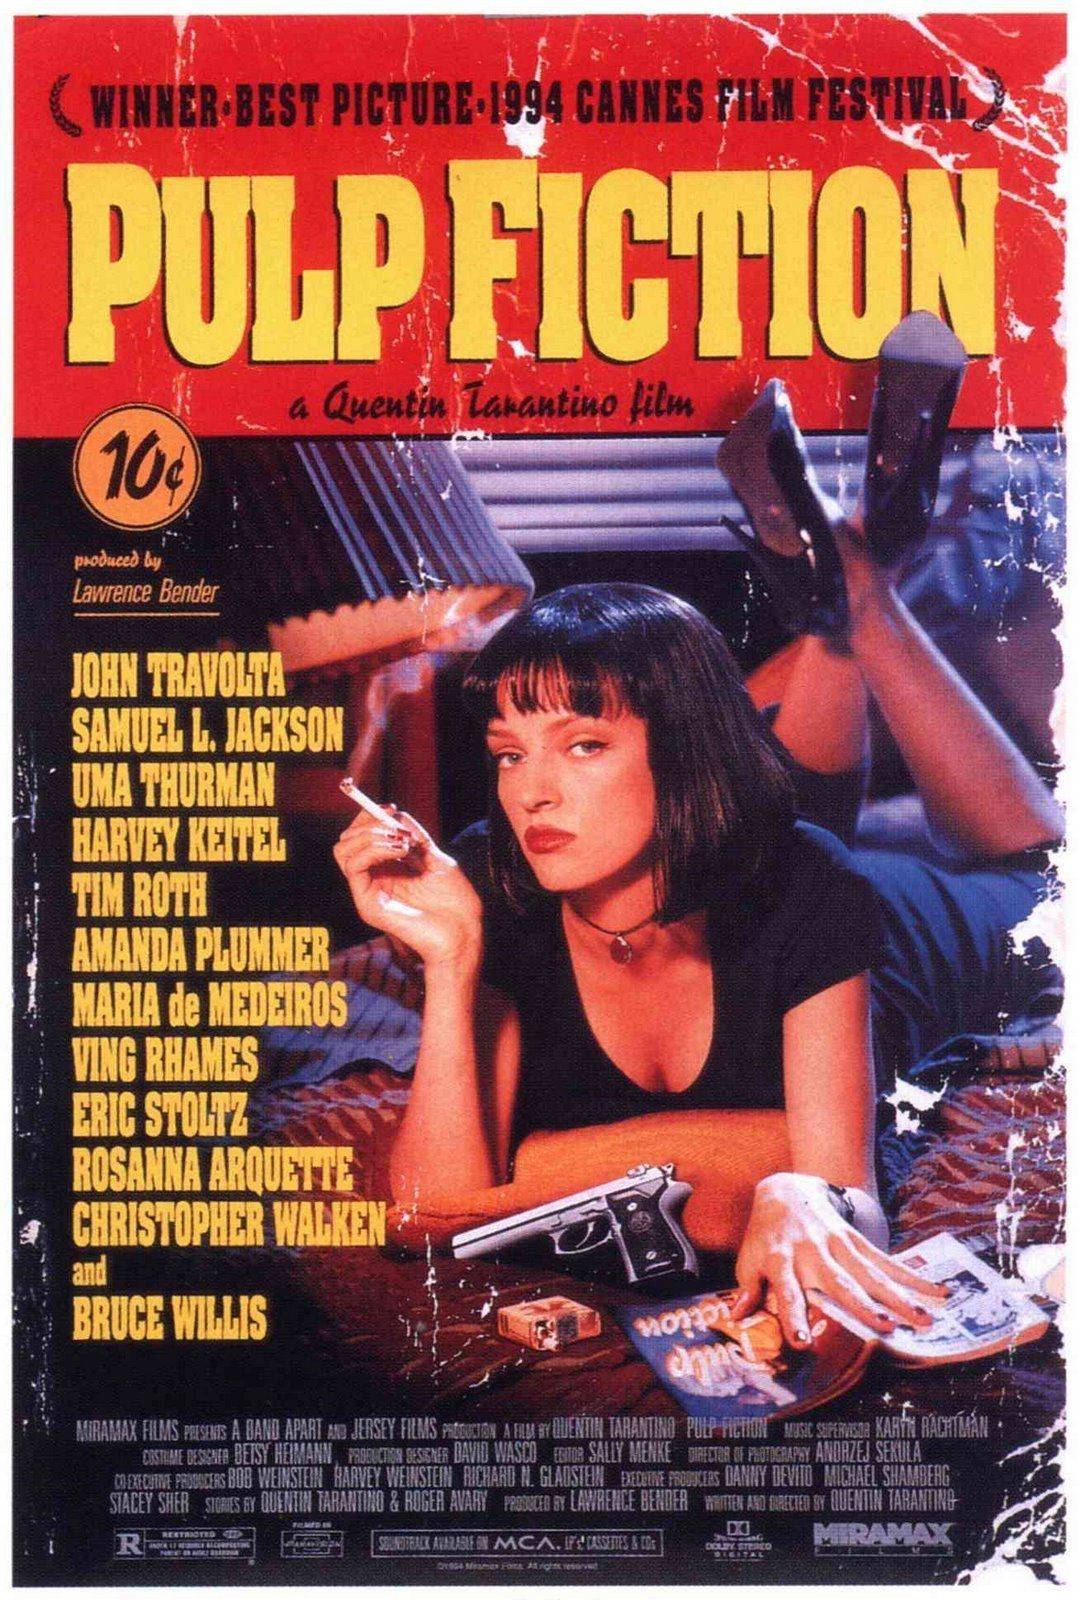 Pulp_Fiction_(1994)_SOS_SOLTEIROS